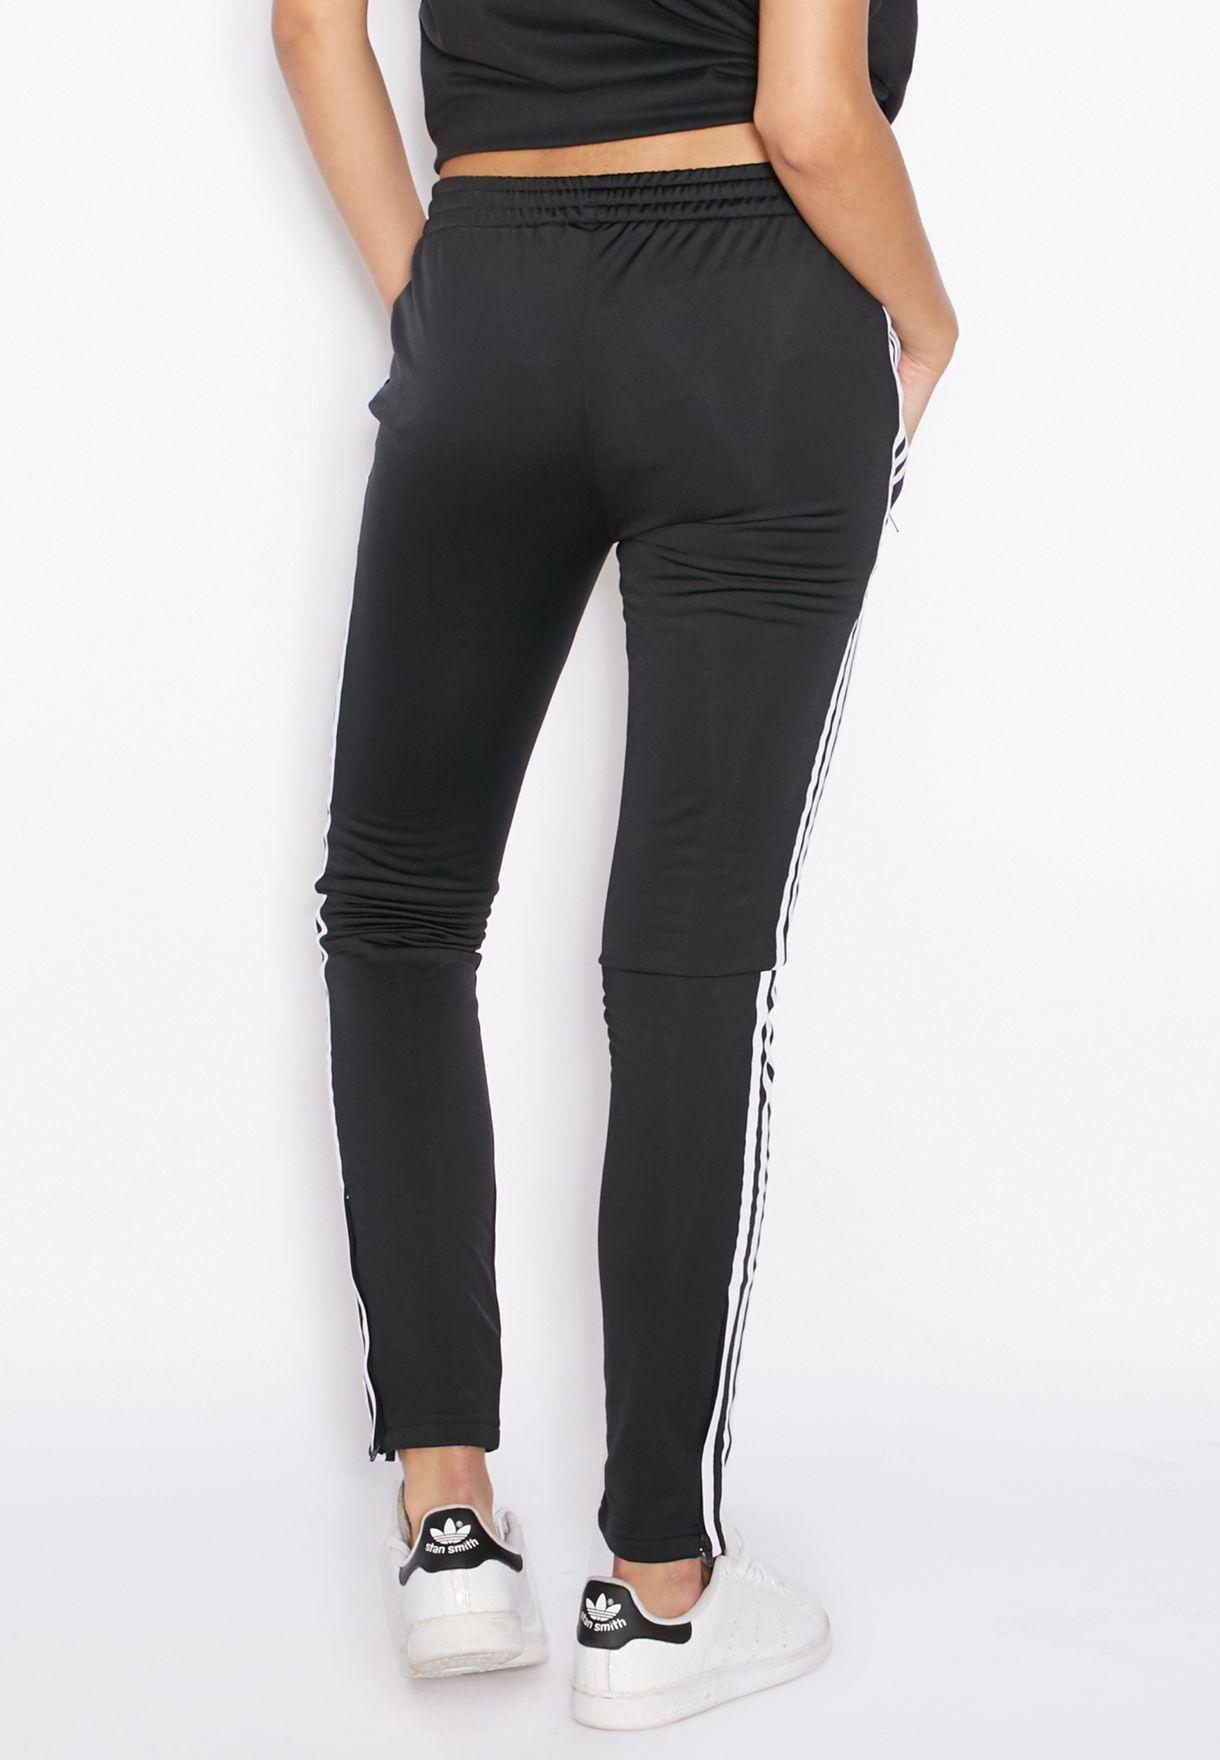 3 Stripe Superstar Sweatpants | Sweatpants, Adidas originals